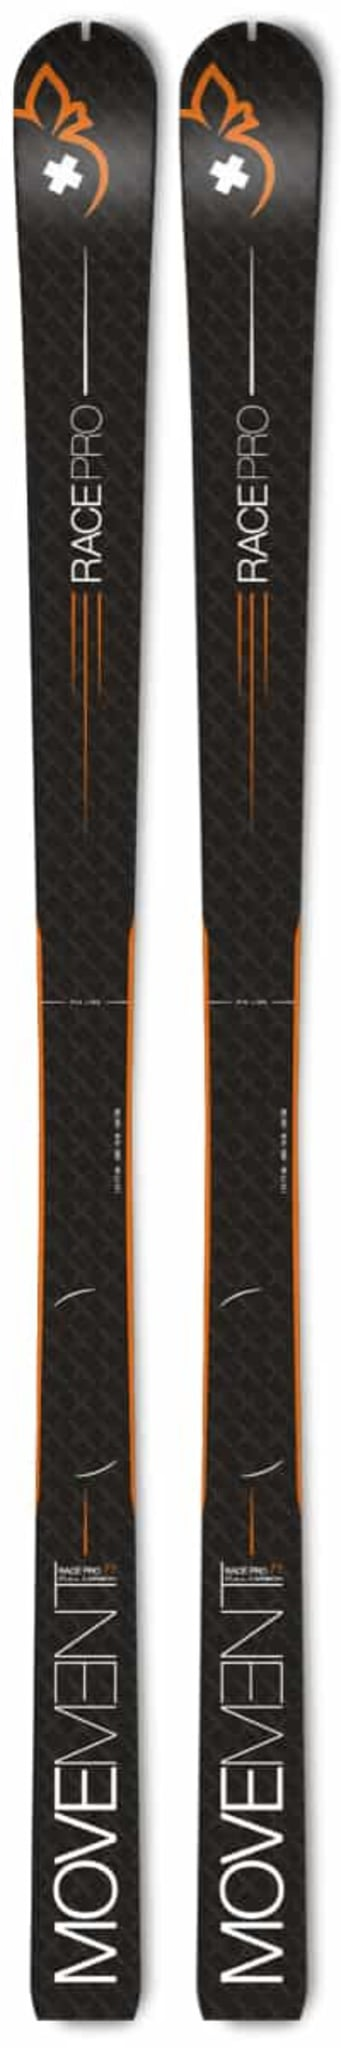 Race Pro 77 Ski & Dynafit Low Tech Race 115 manuell